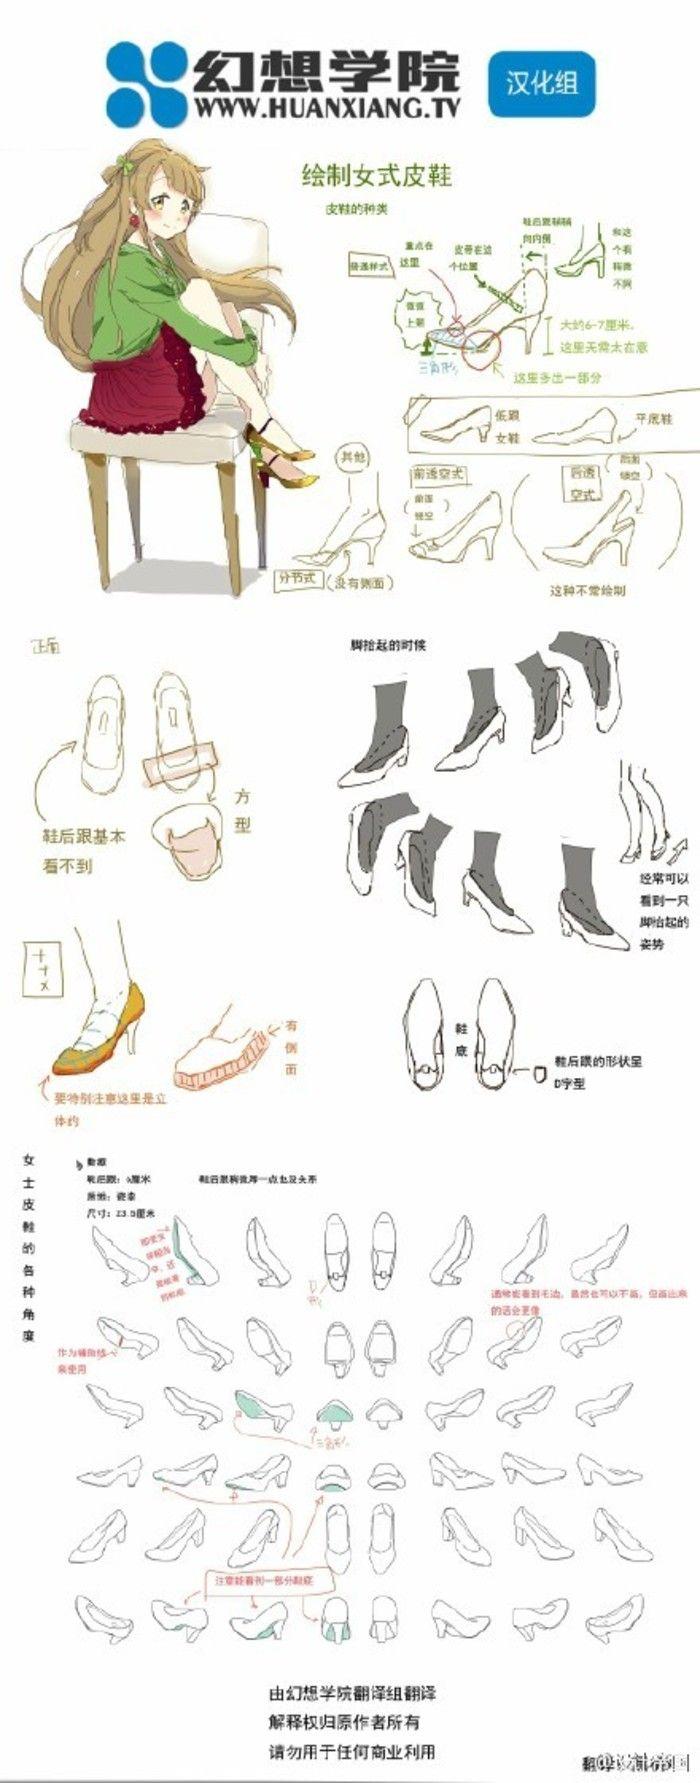 pin by kikyo avan on roupas manga manga drawing tutorials drawing lessons manga drawing